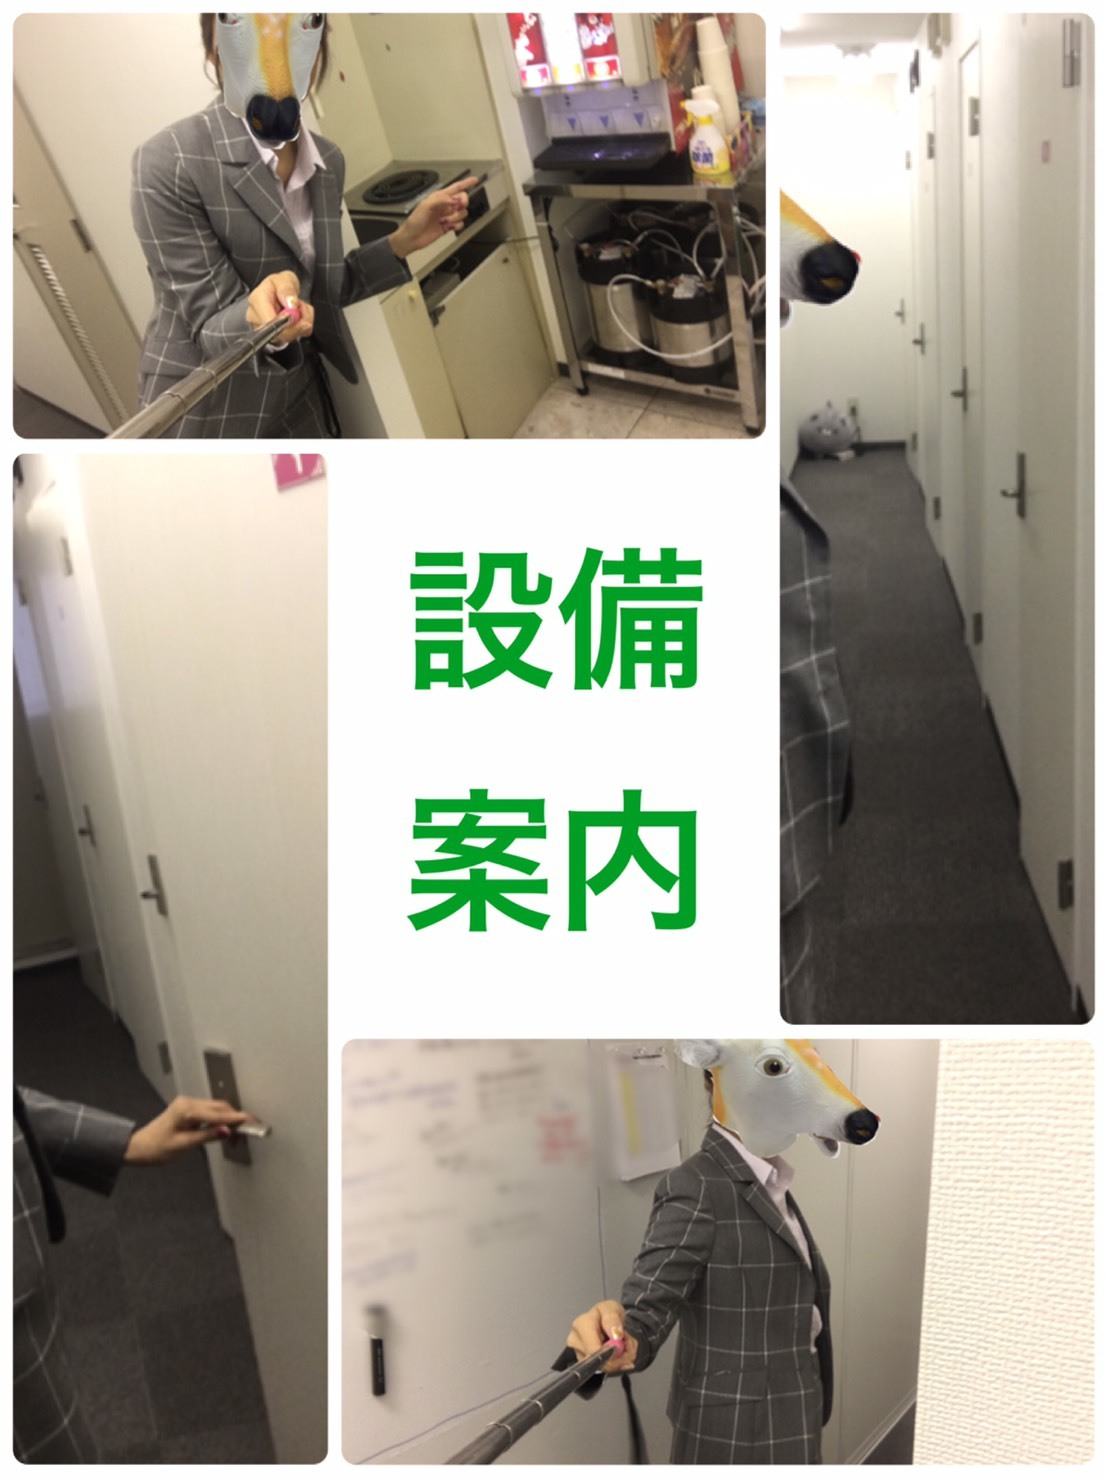 S__32448521.jpg